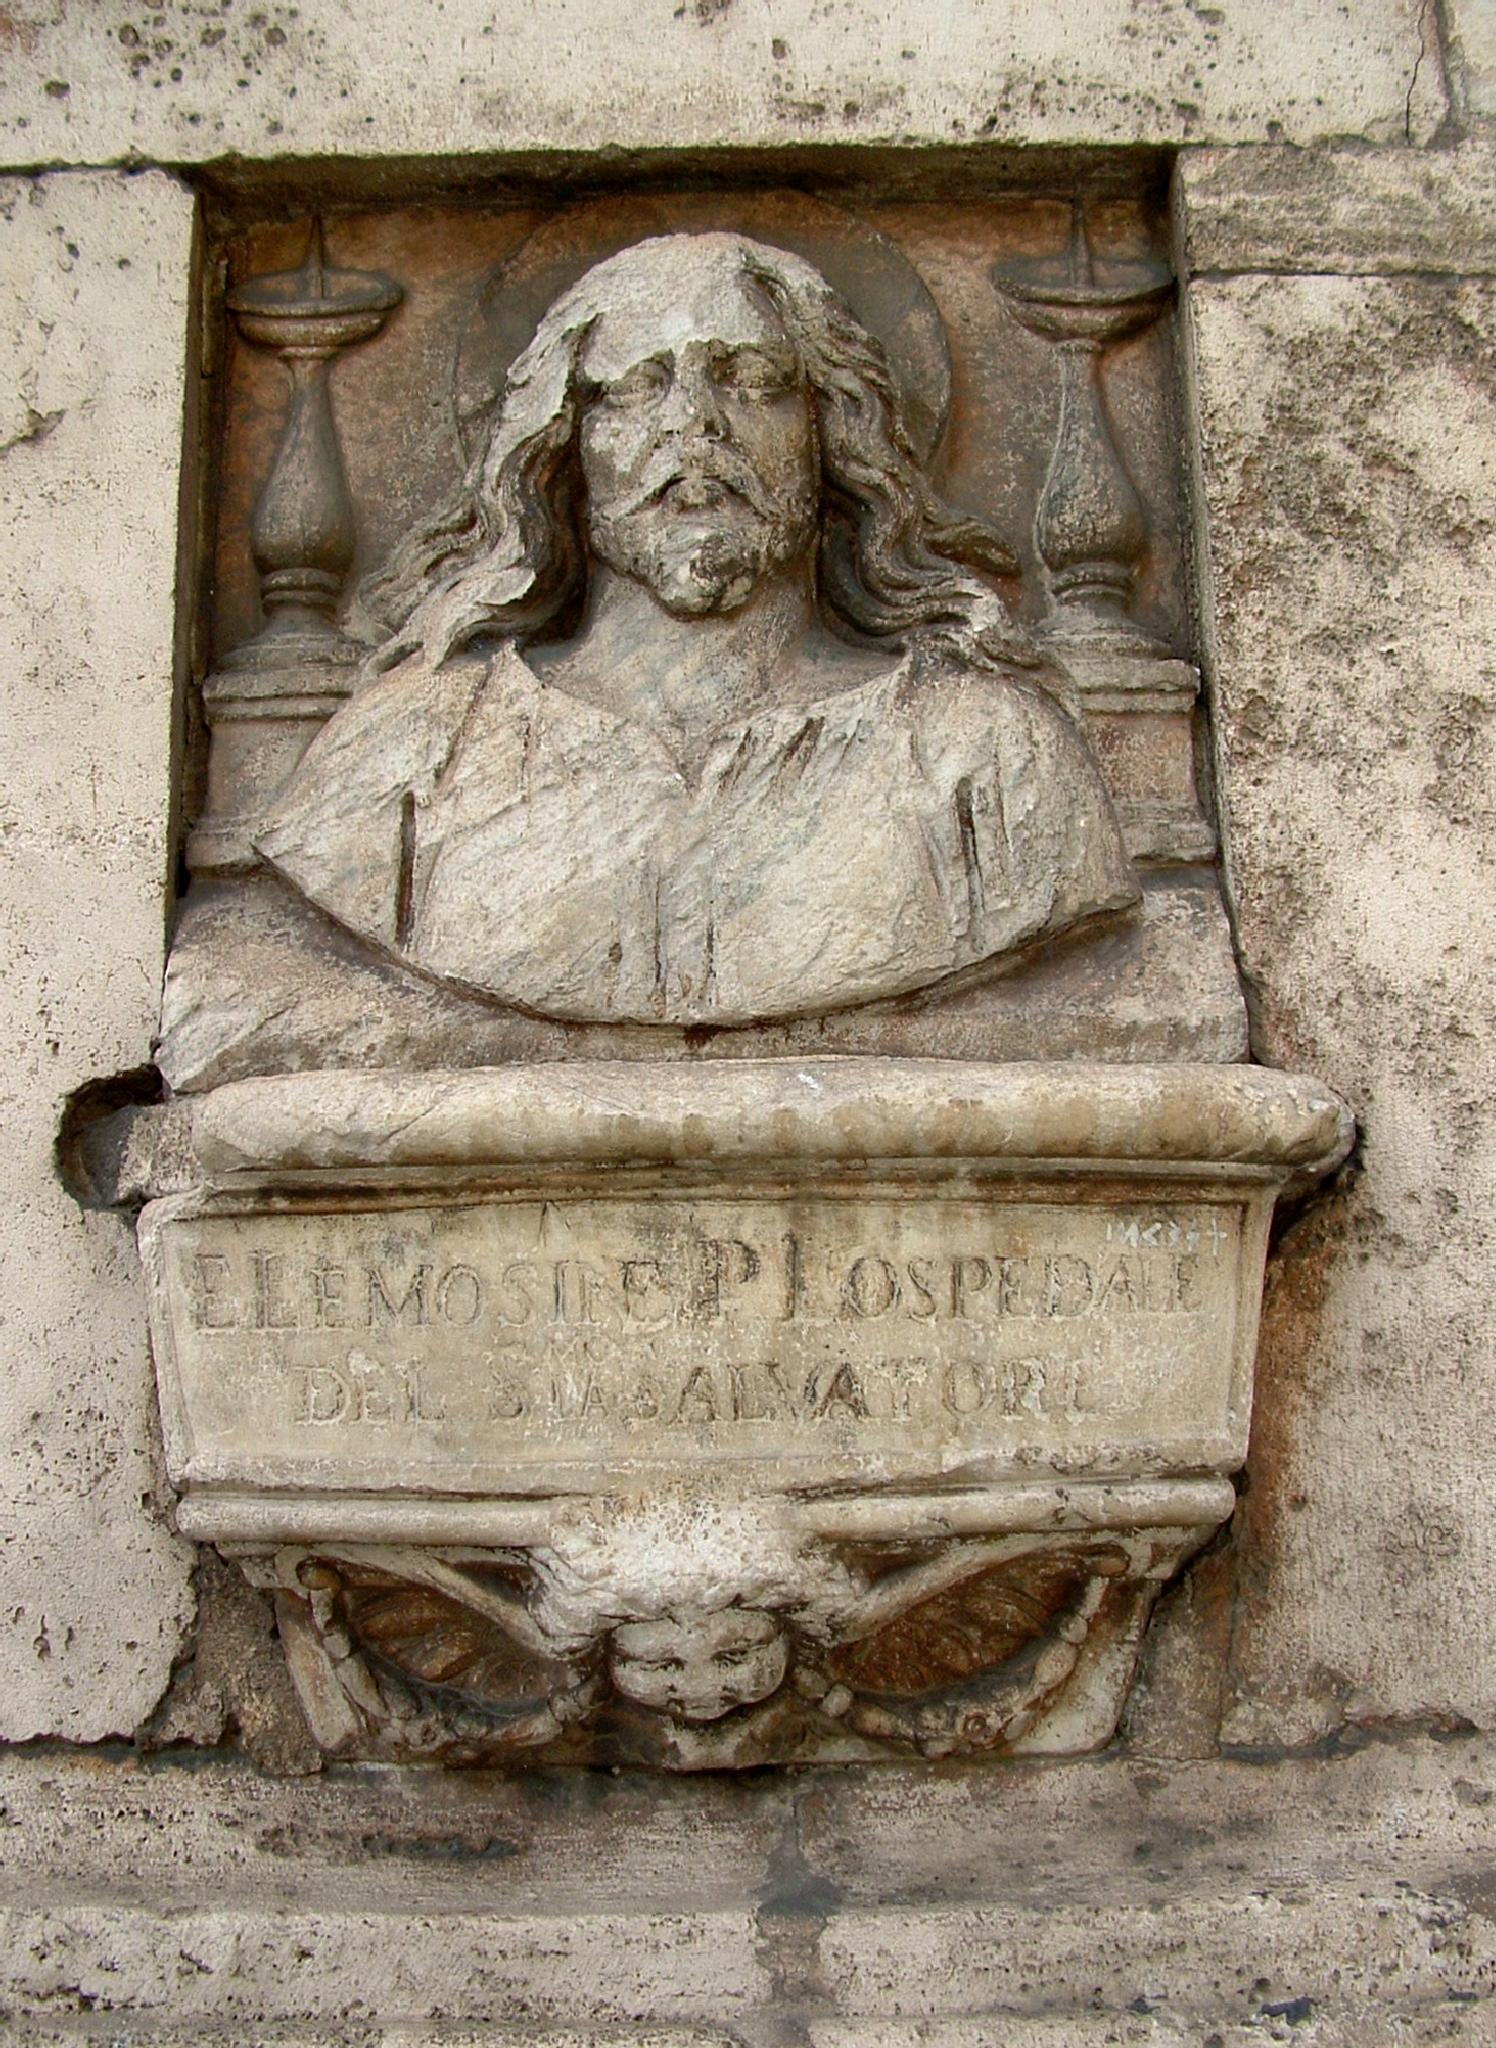 Elemosiniere in marmo by Salvatore Bertolino